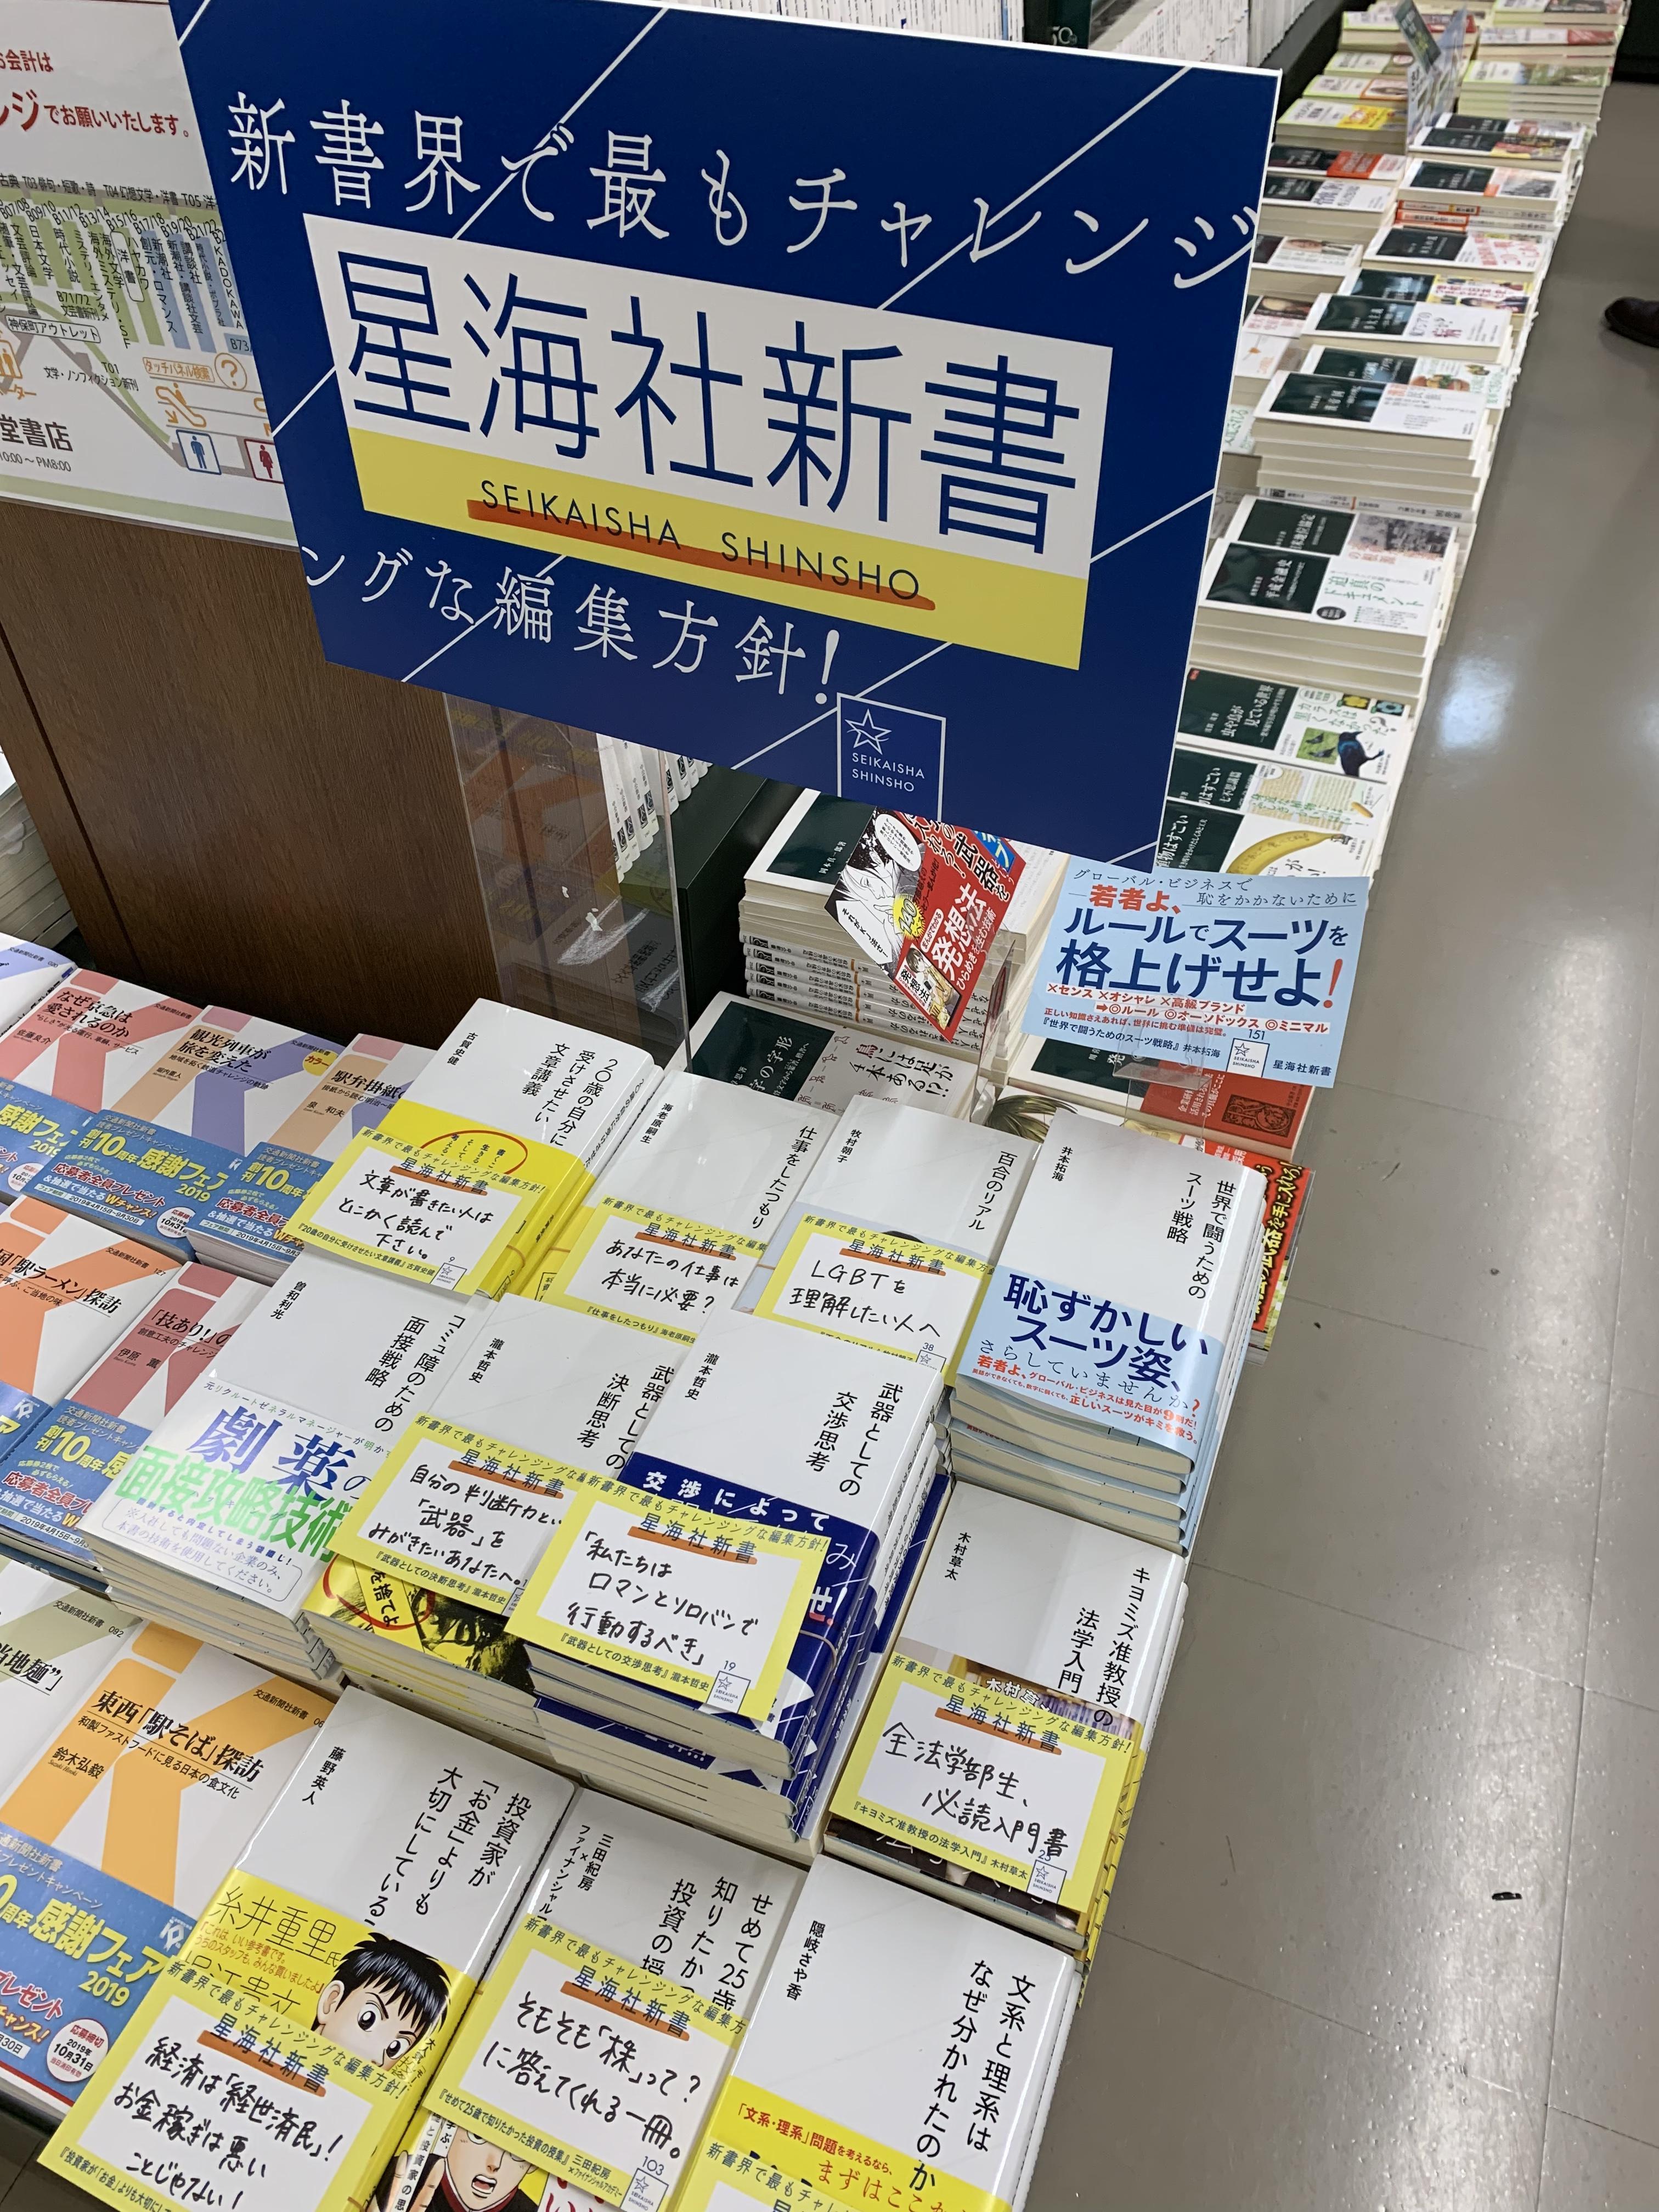 https://ji-sedai.jp/editor/blog/360b912d40a5e39064dd78d72bcf4863.jpeg